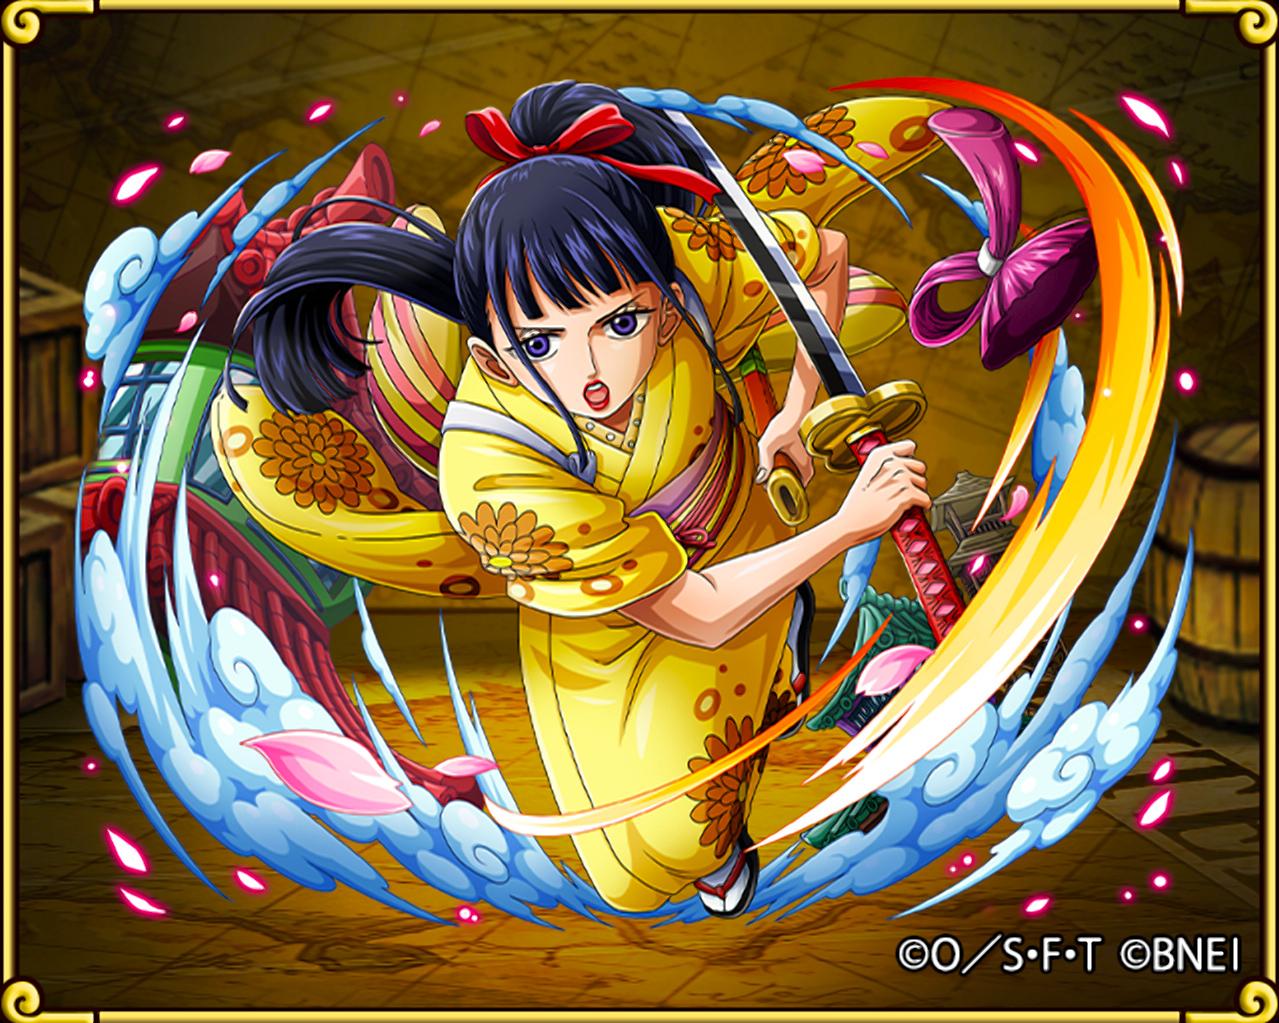 ONE PIECE   page 6 of 1025 - Zerochan Anime Image Board